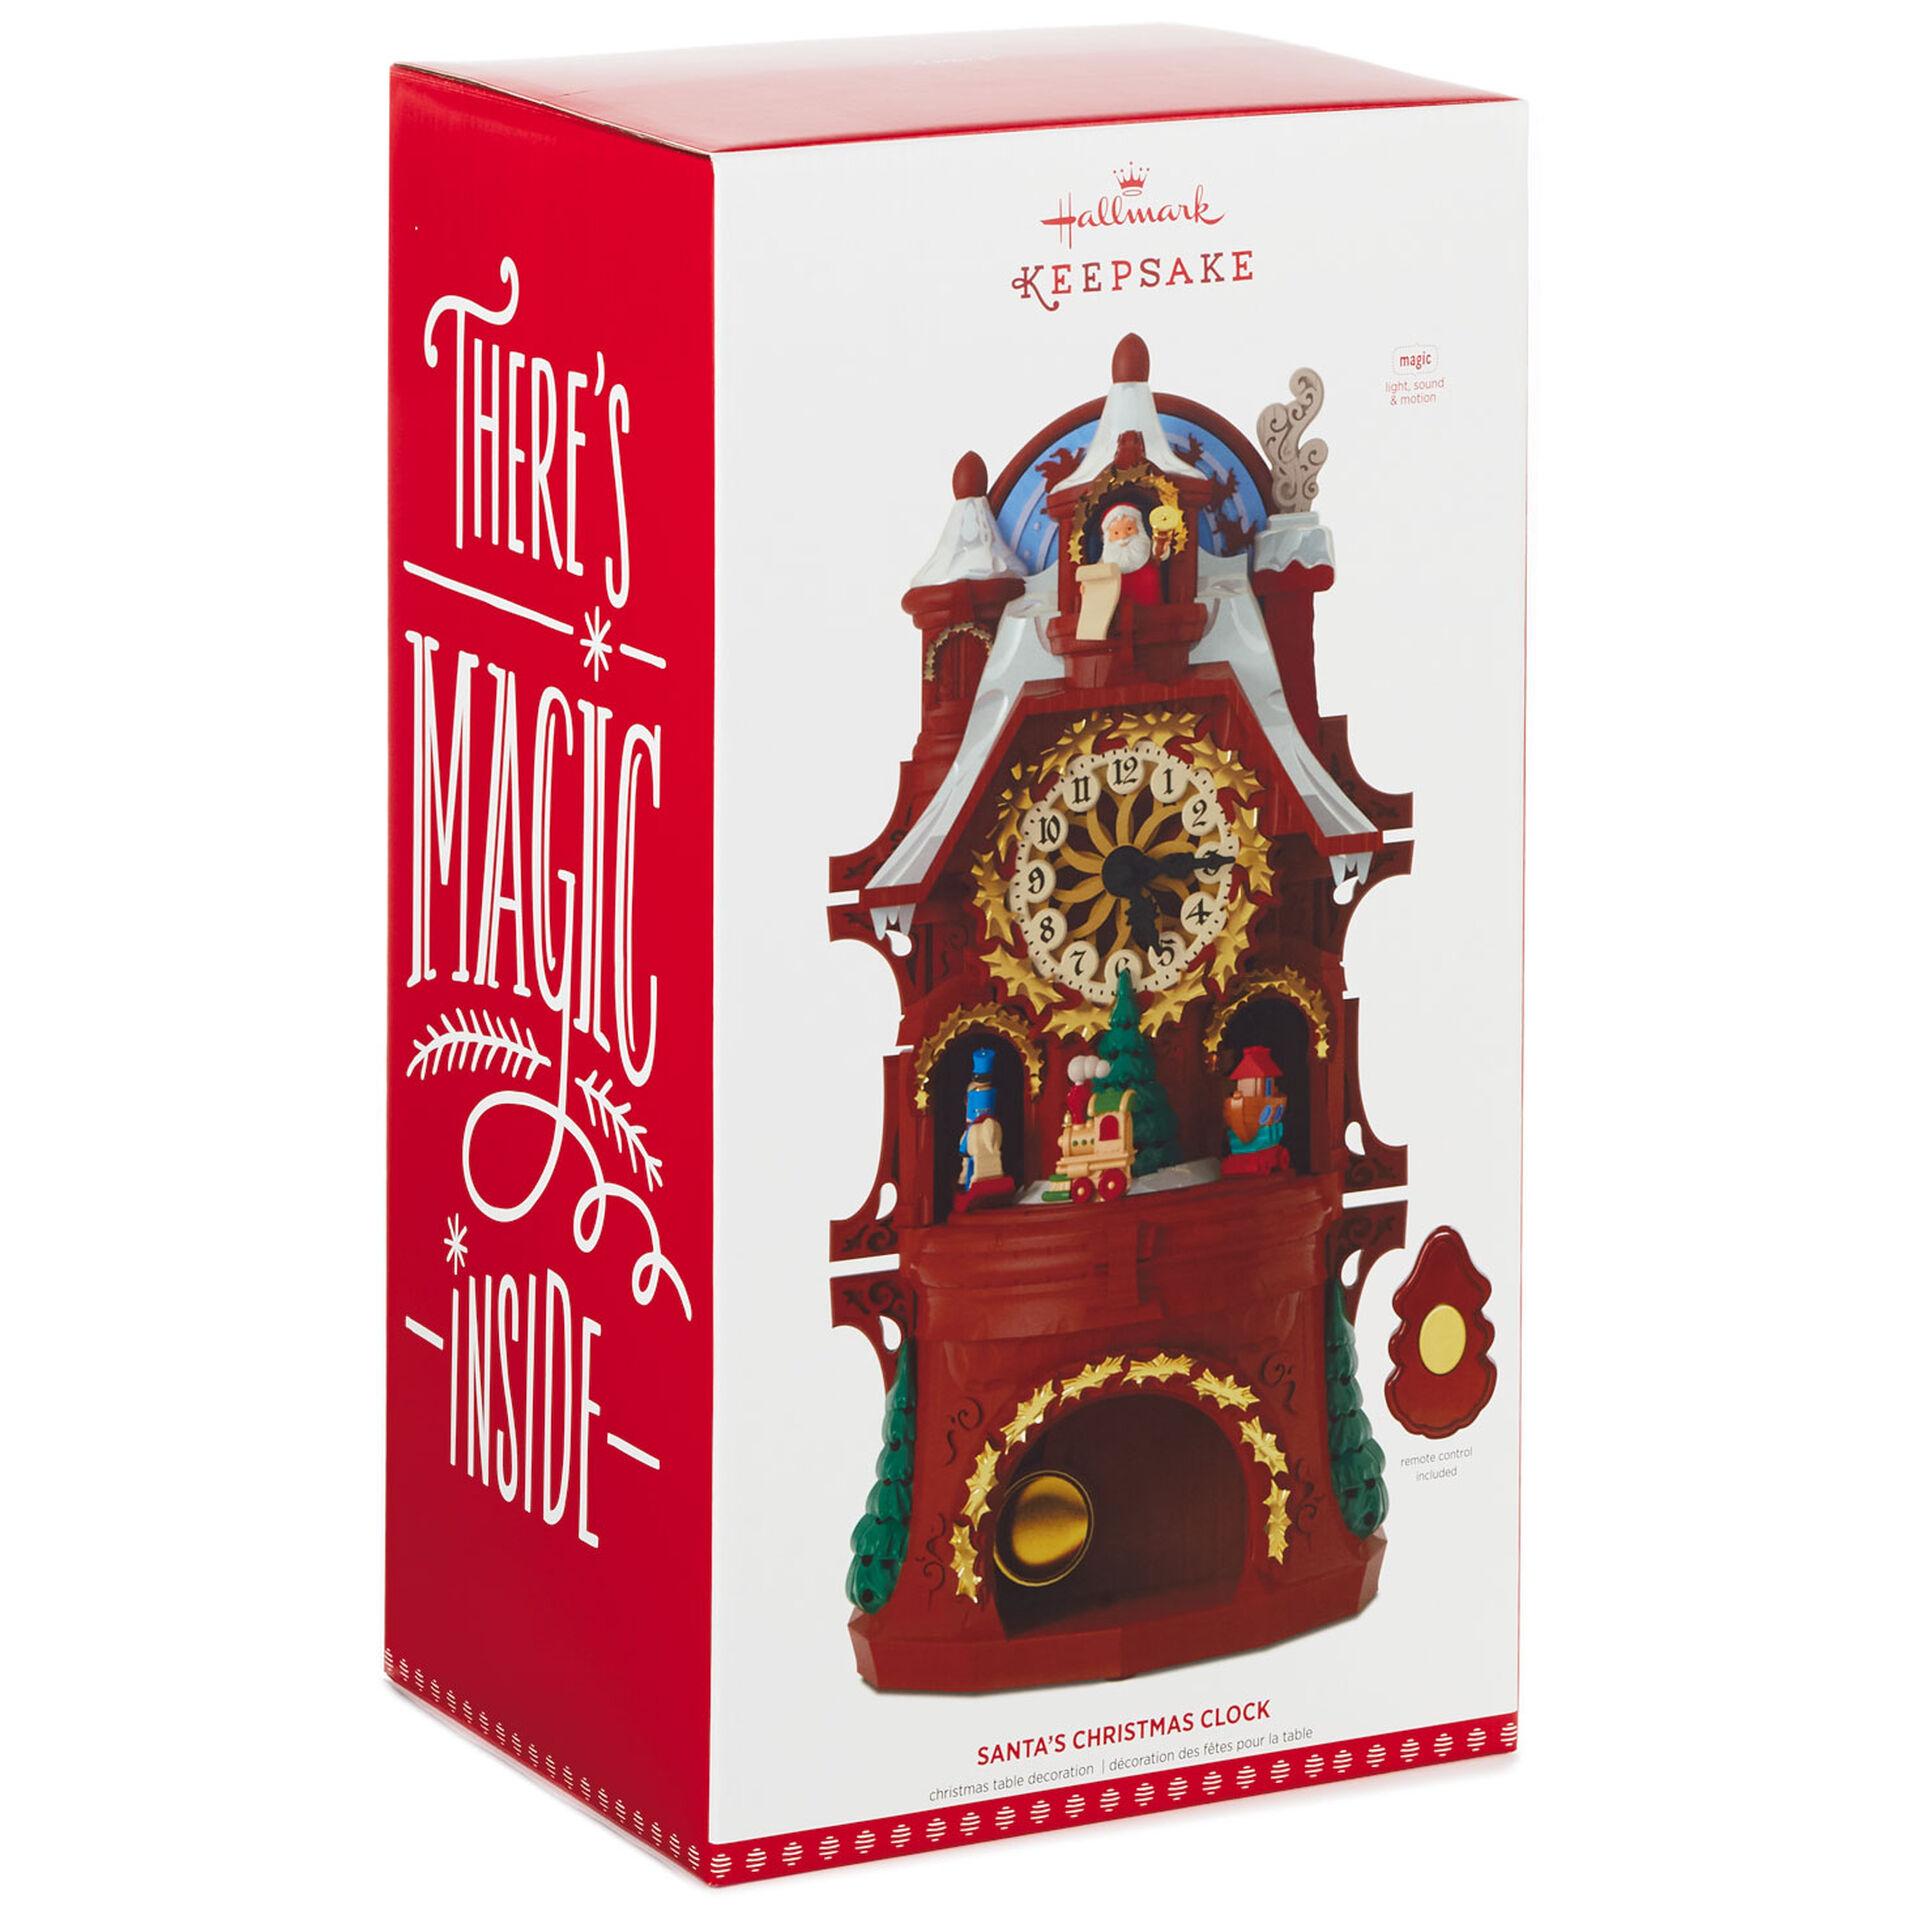 Santa S Musical Christmas Clock With Motion And Light Keepsake Ornaments Hallmark